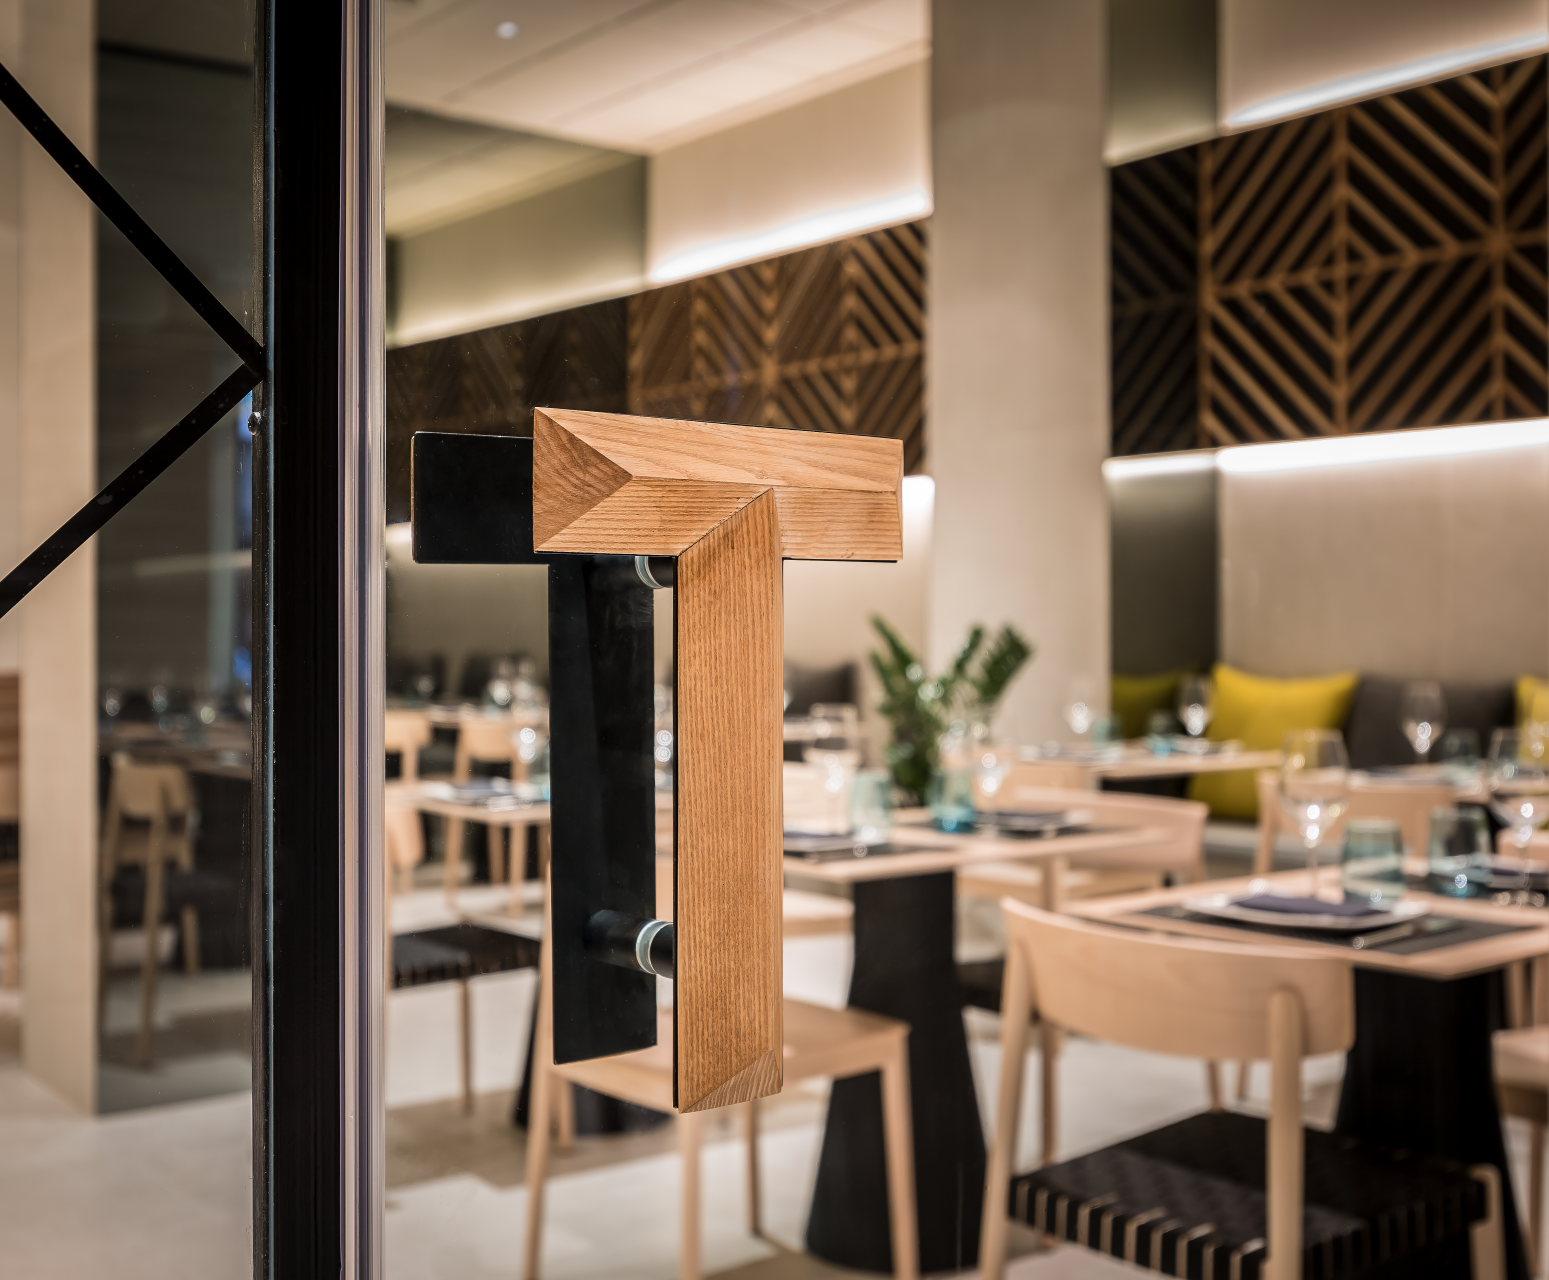 fotografia-arquitectura–interiorismo-valencia-german-cabo-estudihac-restaurante-tipics-xativa (7)